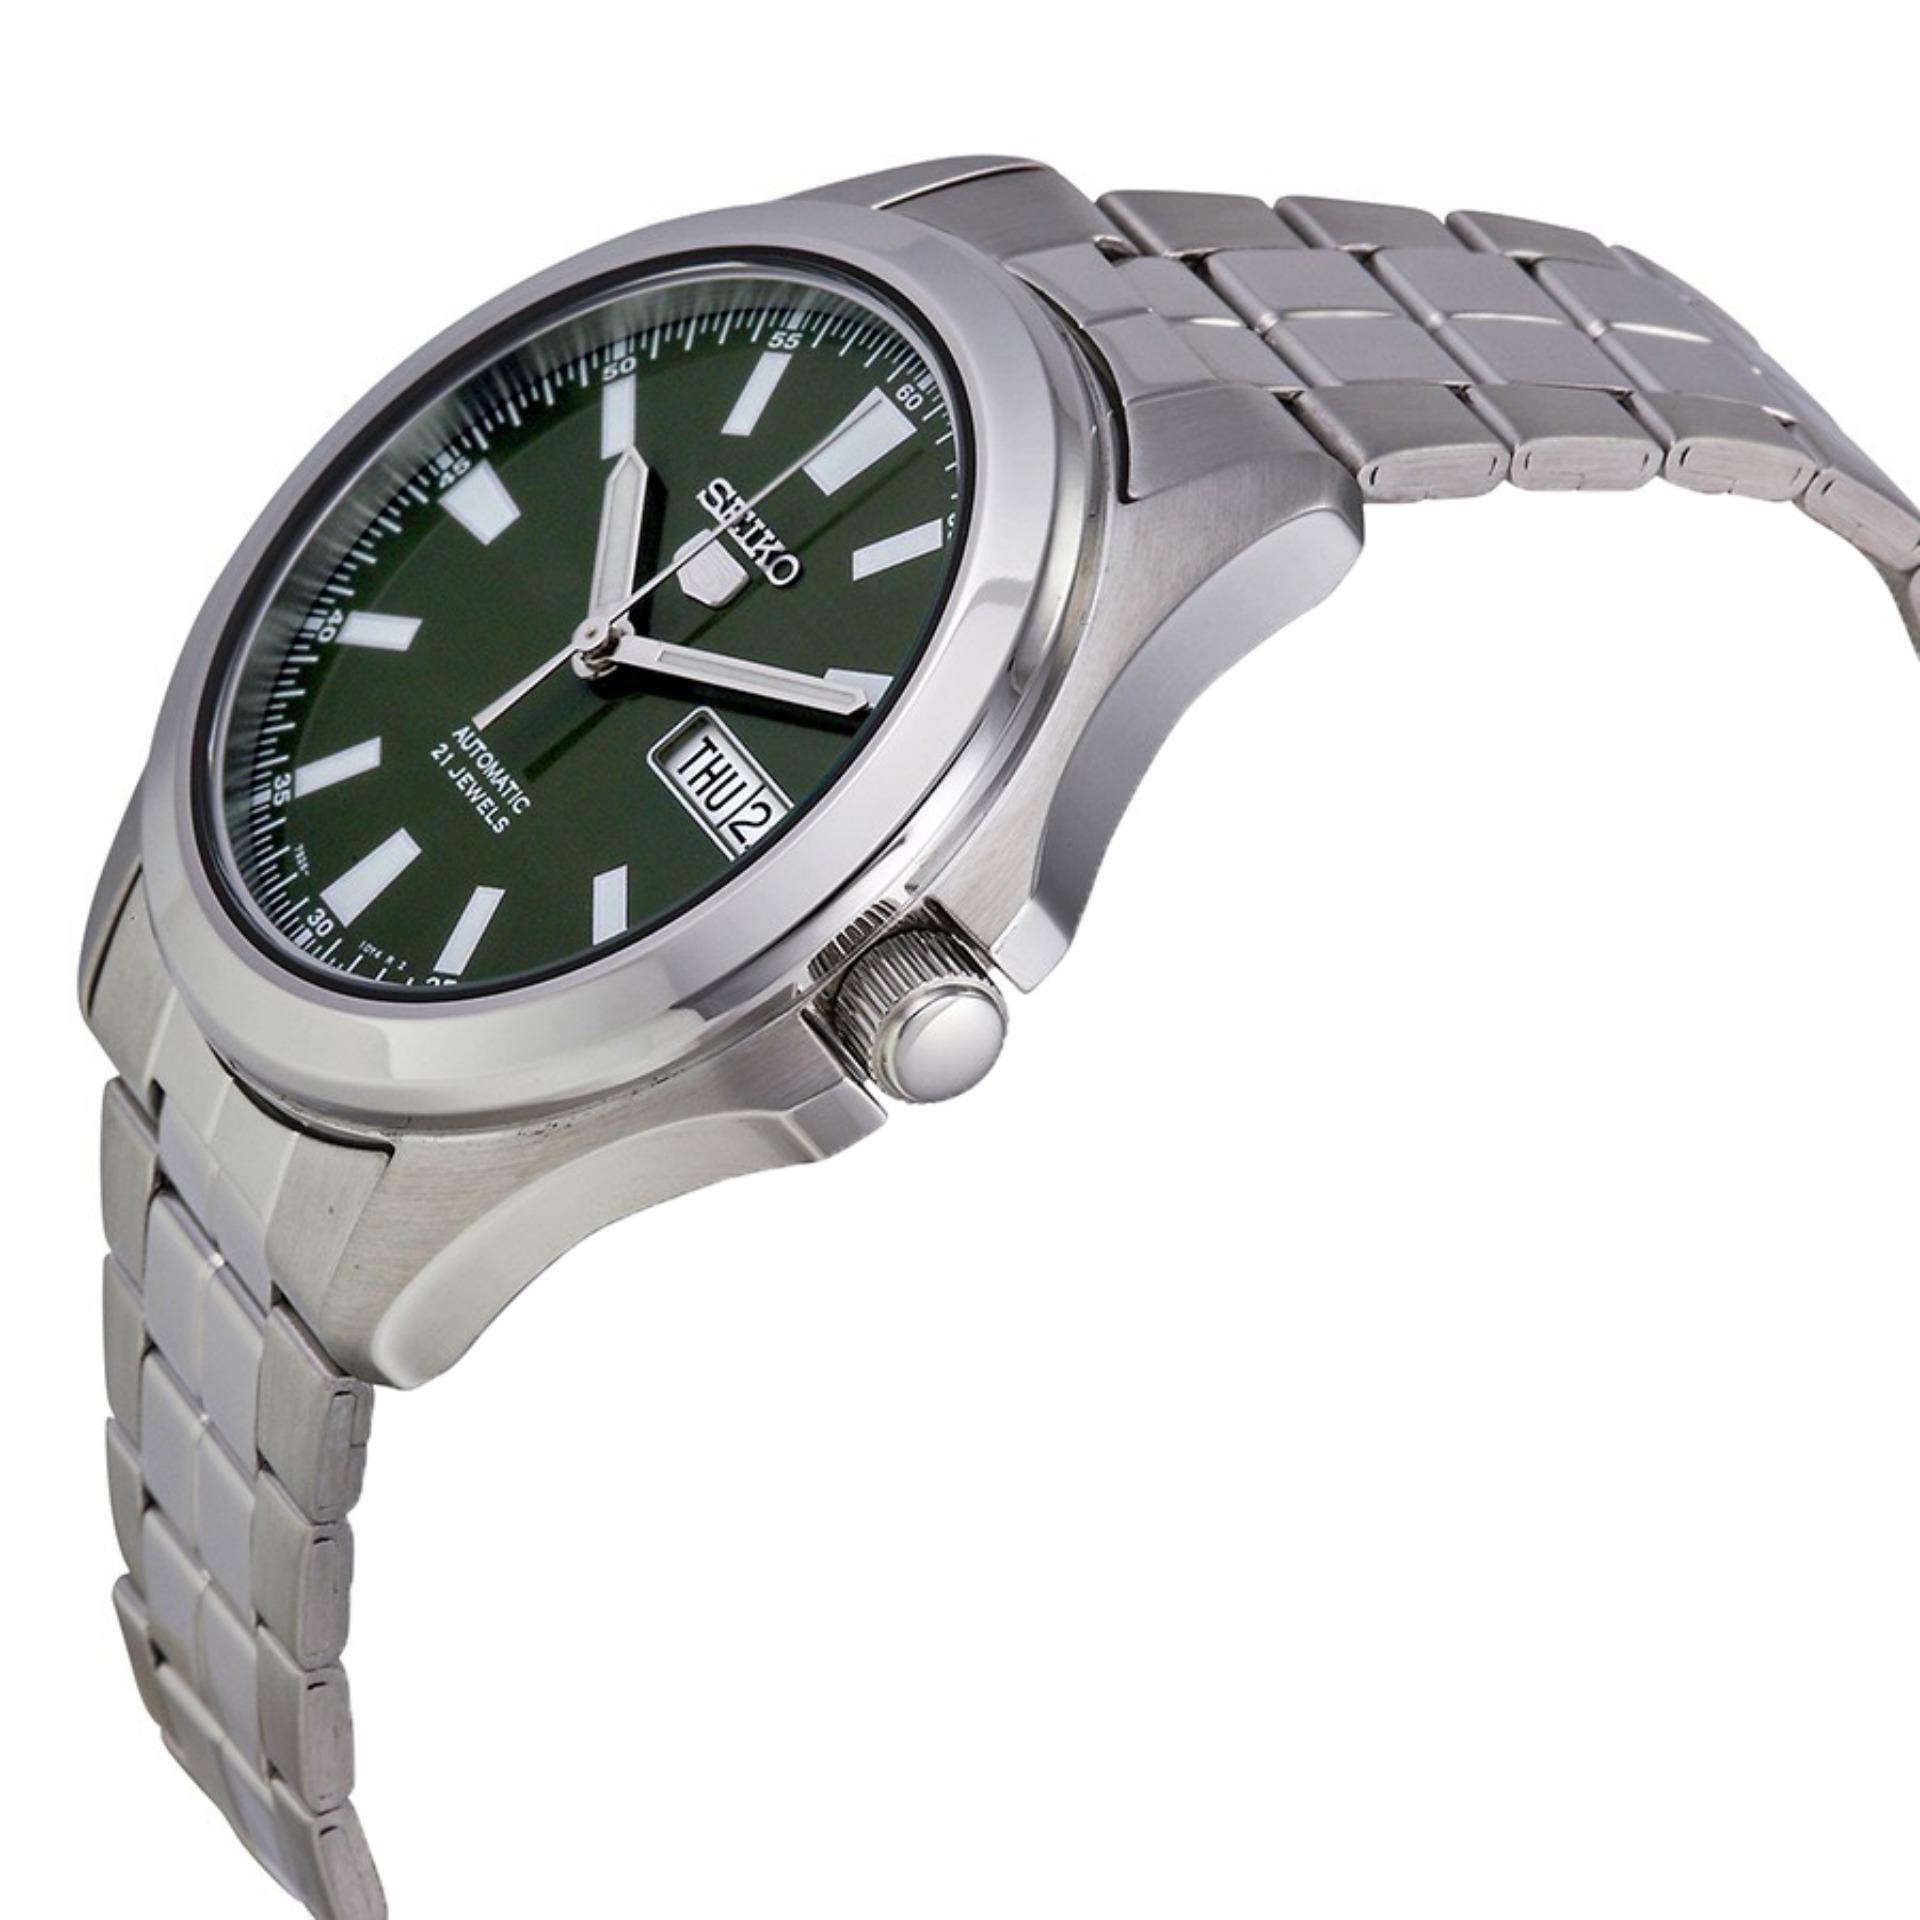 Seiko 5 Automatic Jam Tangan Starp Stainless Steel Silver Snkn85k1 Sport Srp487k1 Tali Logam Pria Detail Gambar Snkl05 Strap Terbaru